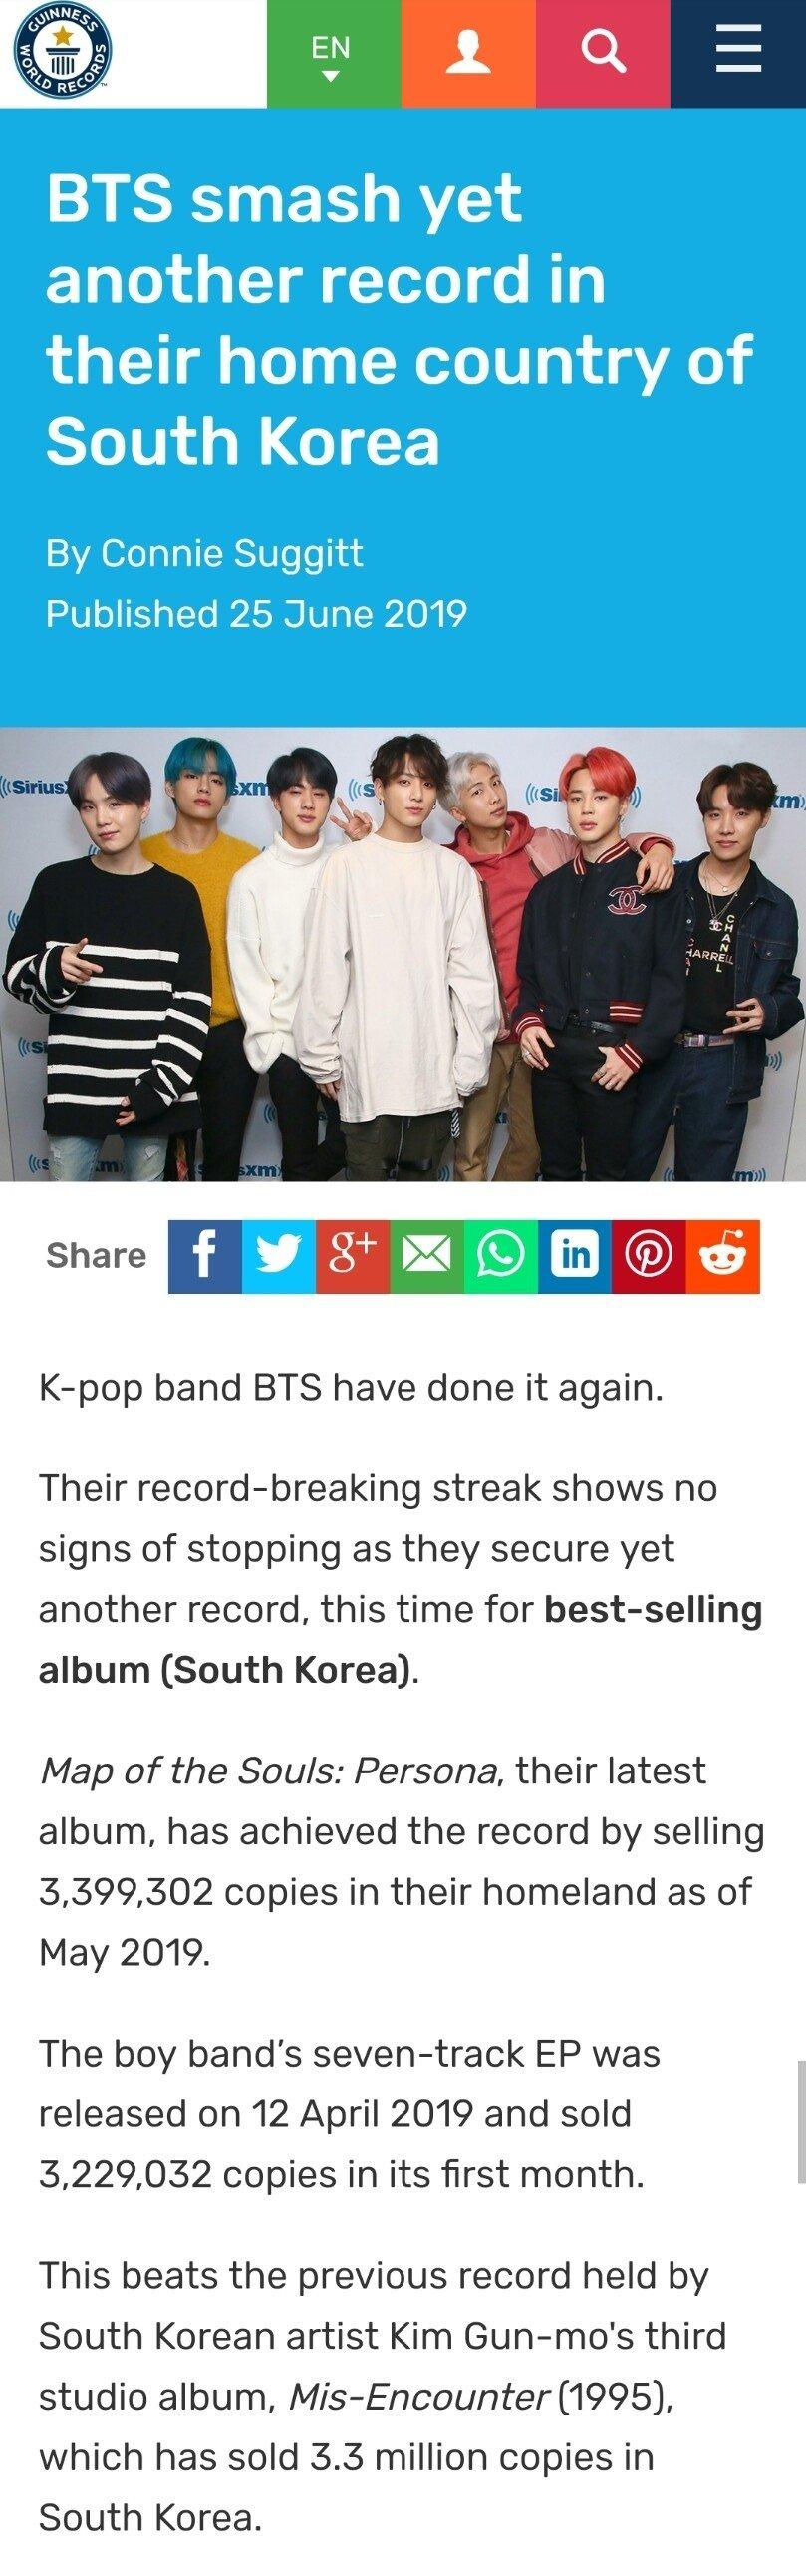 Screenshot_20190626-113615_Chrome.jpg BTS, 한국 역대 최다 음반 판매로 기네스북 등재